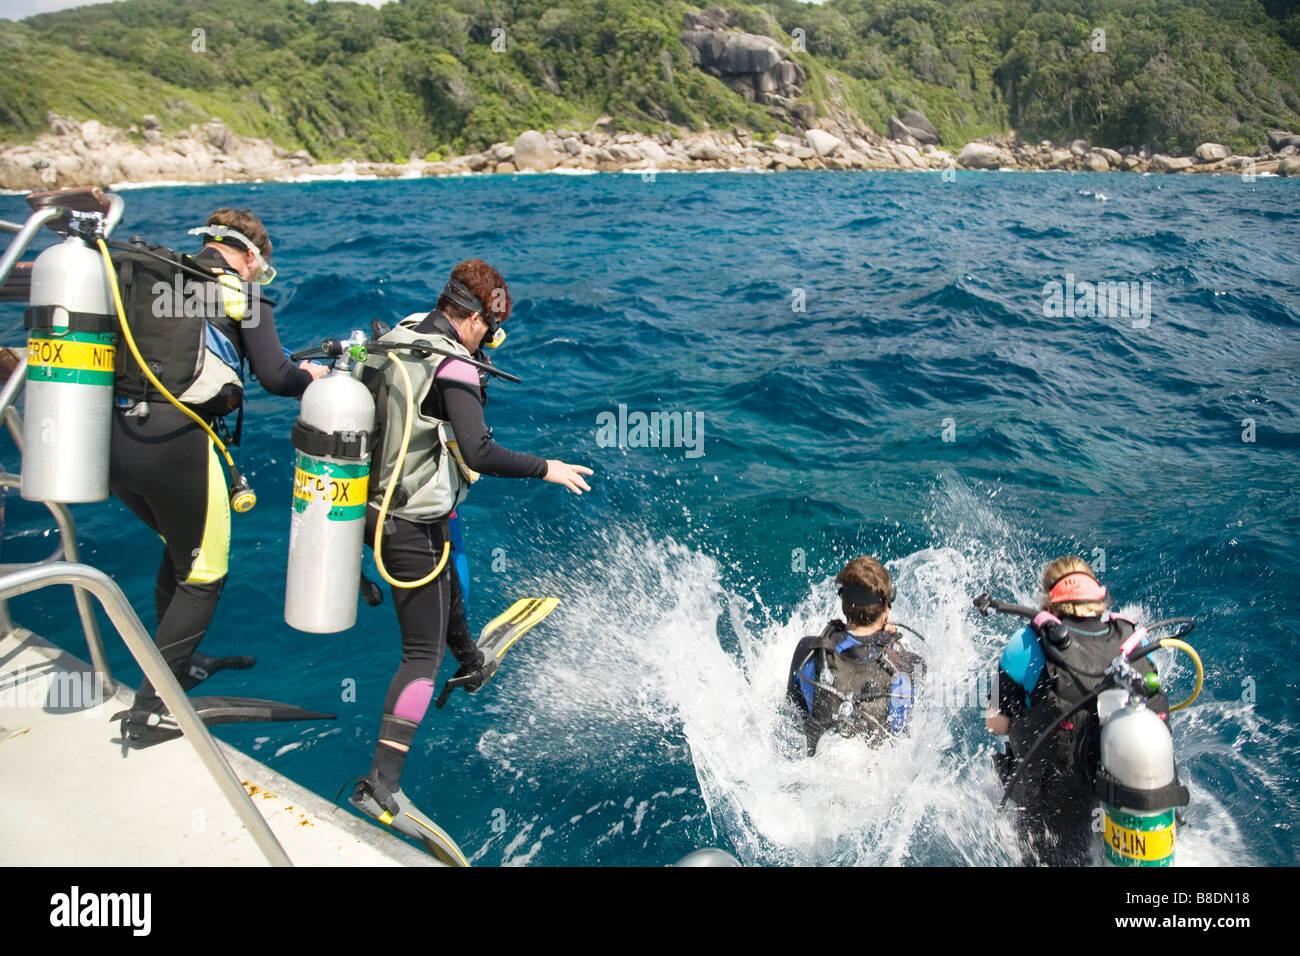 Scuba diving at similan islands - Stock Image